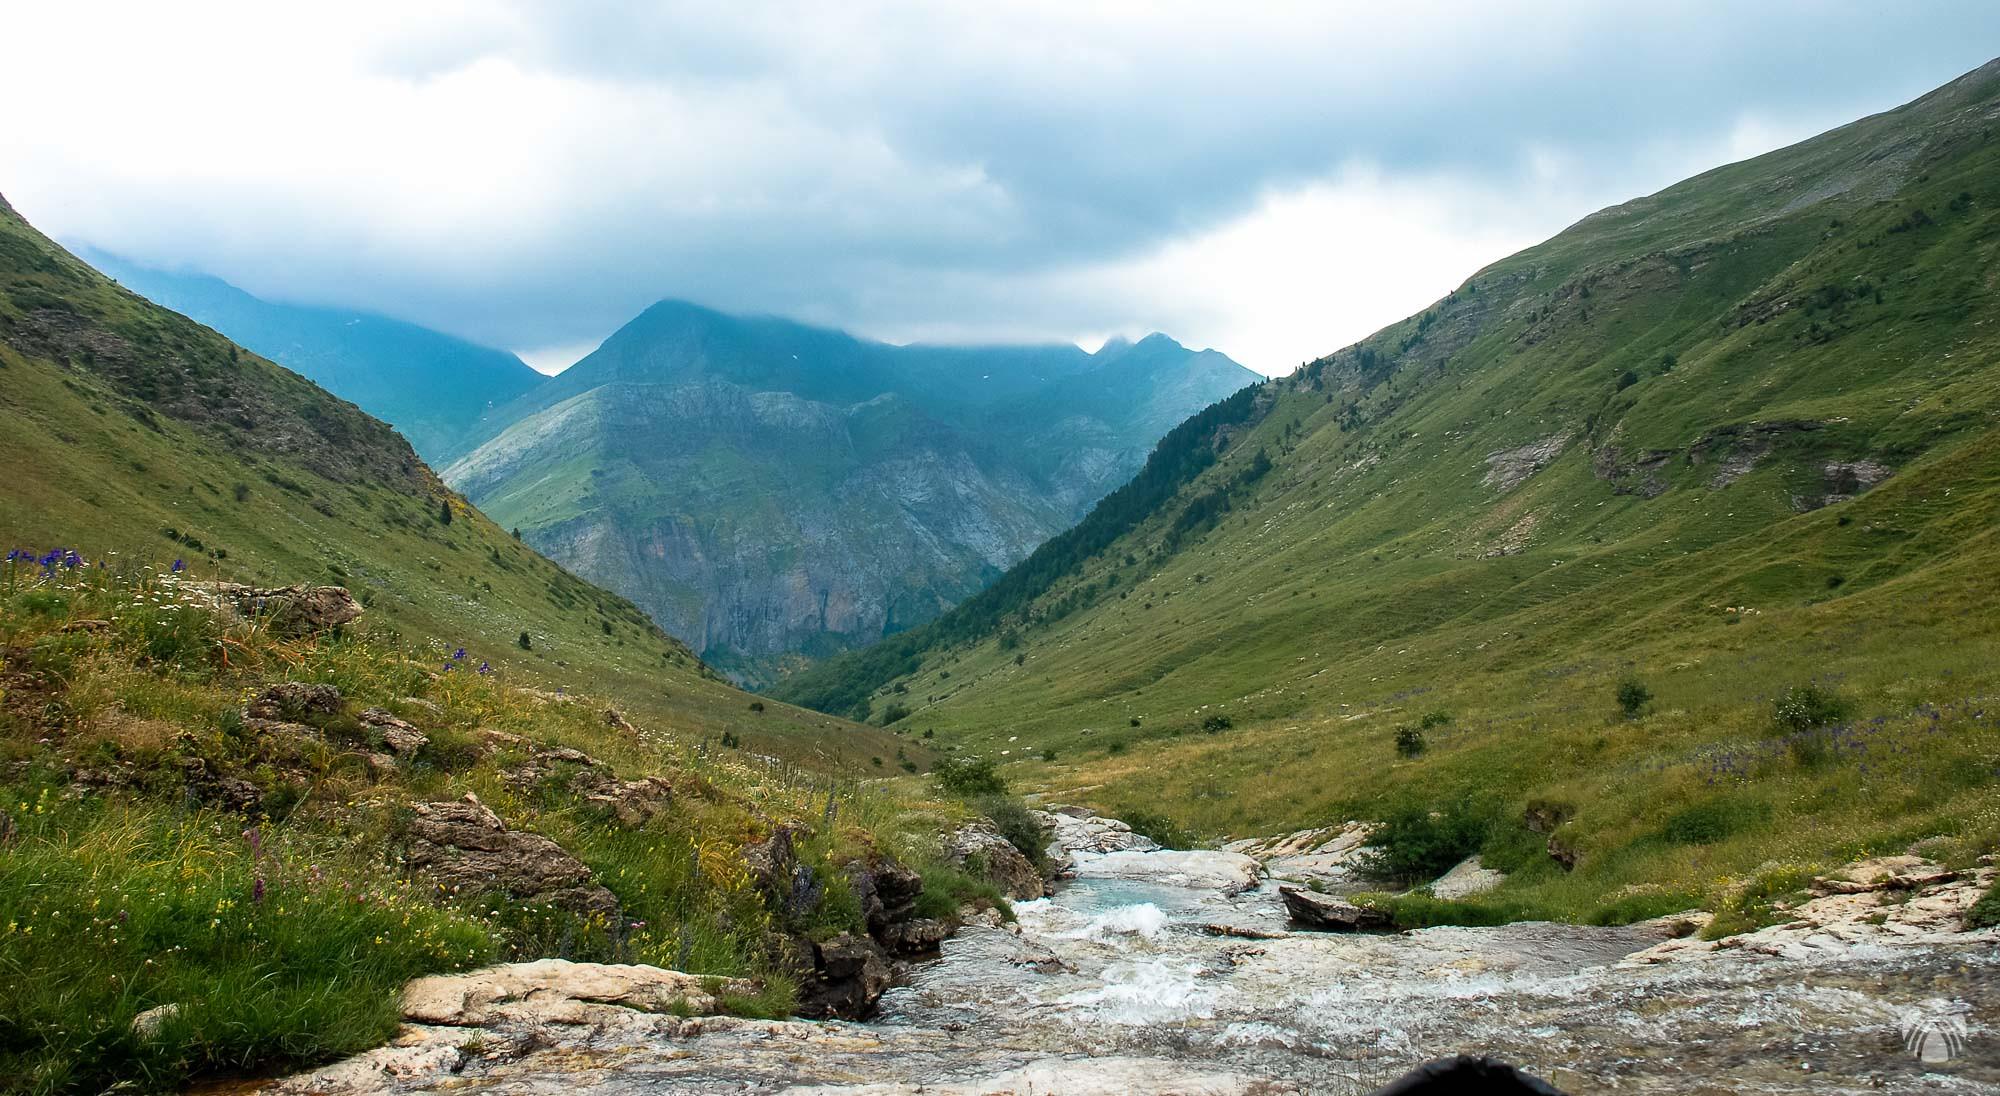 Valle de Ordiso. Sierra de Sandaruelo enfrente